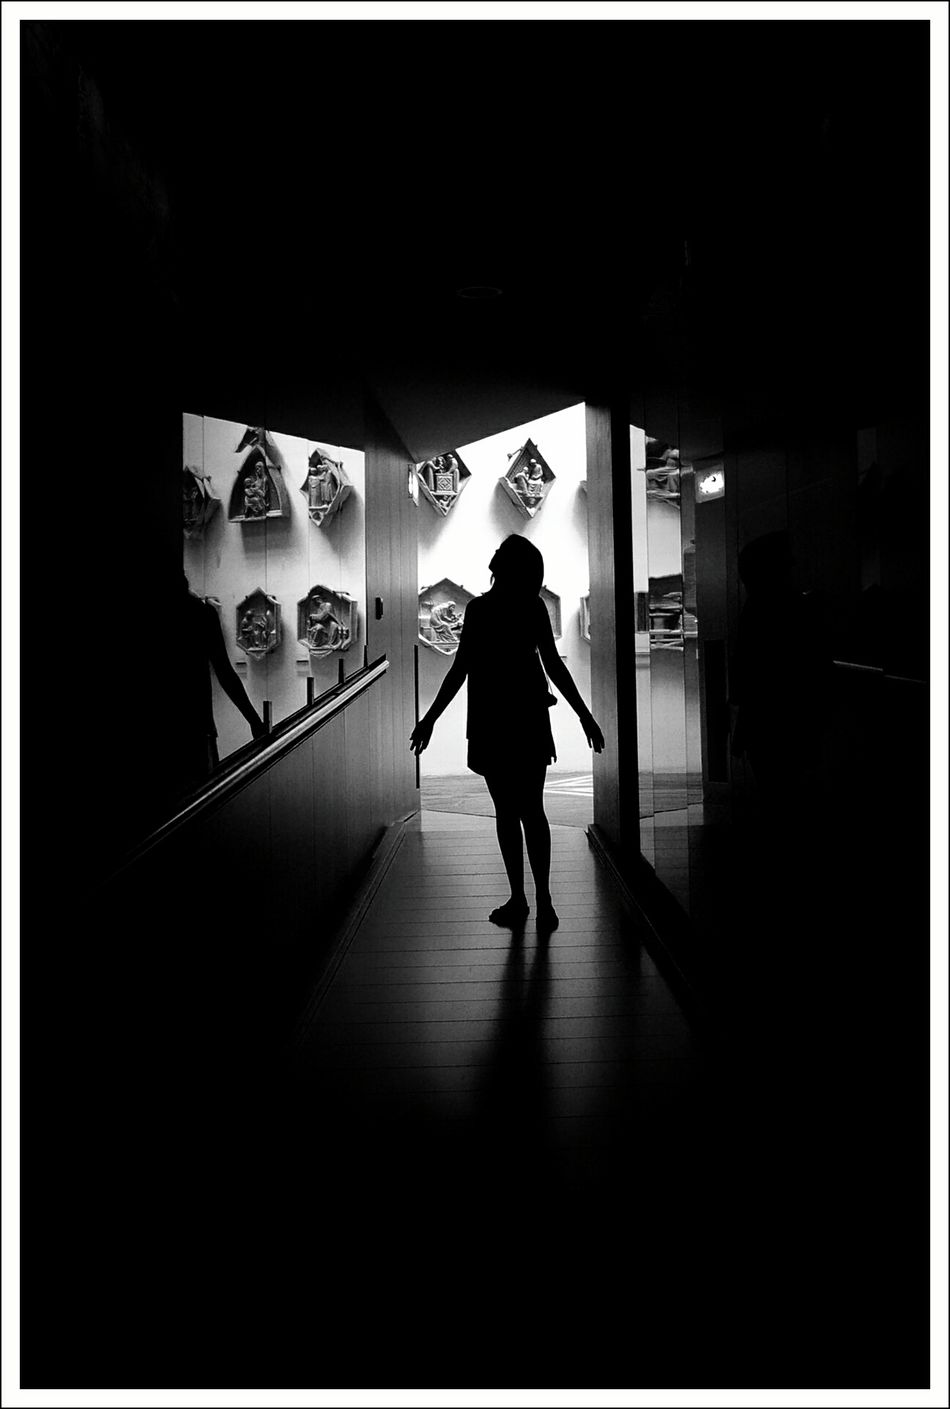 The girl who wanted to make her own series Blanco & Negro  EyeEm Best Shots - Black + White Blanco Y Negro Monochrome Black & White Getting Inspired Snapshots Of Life Siluette Siluetas La Falsa Envoltura De Las Apariencias